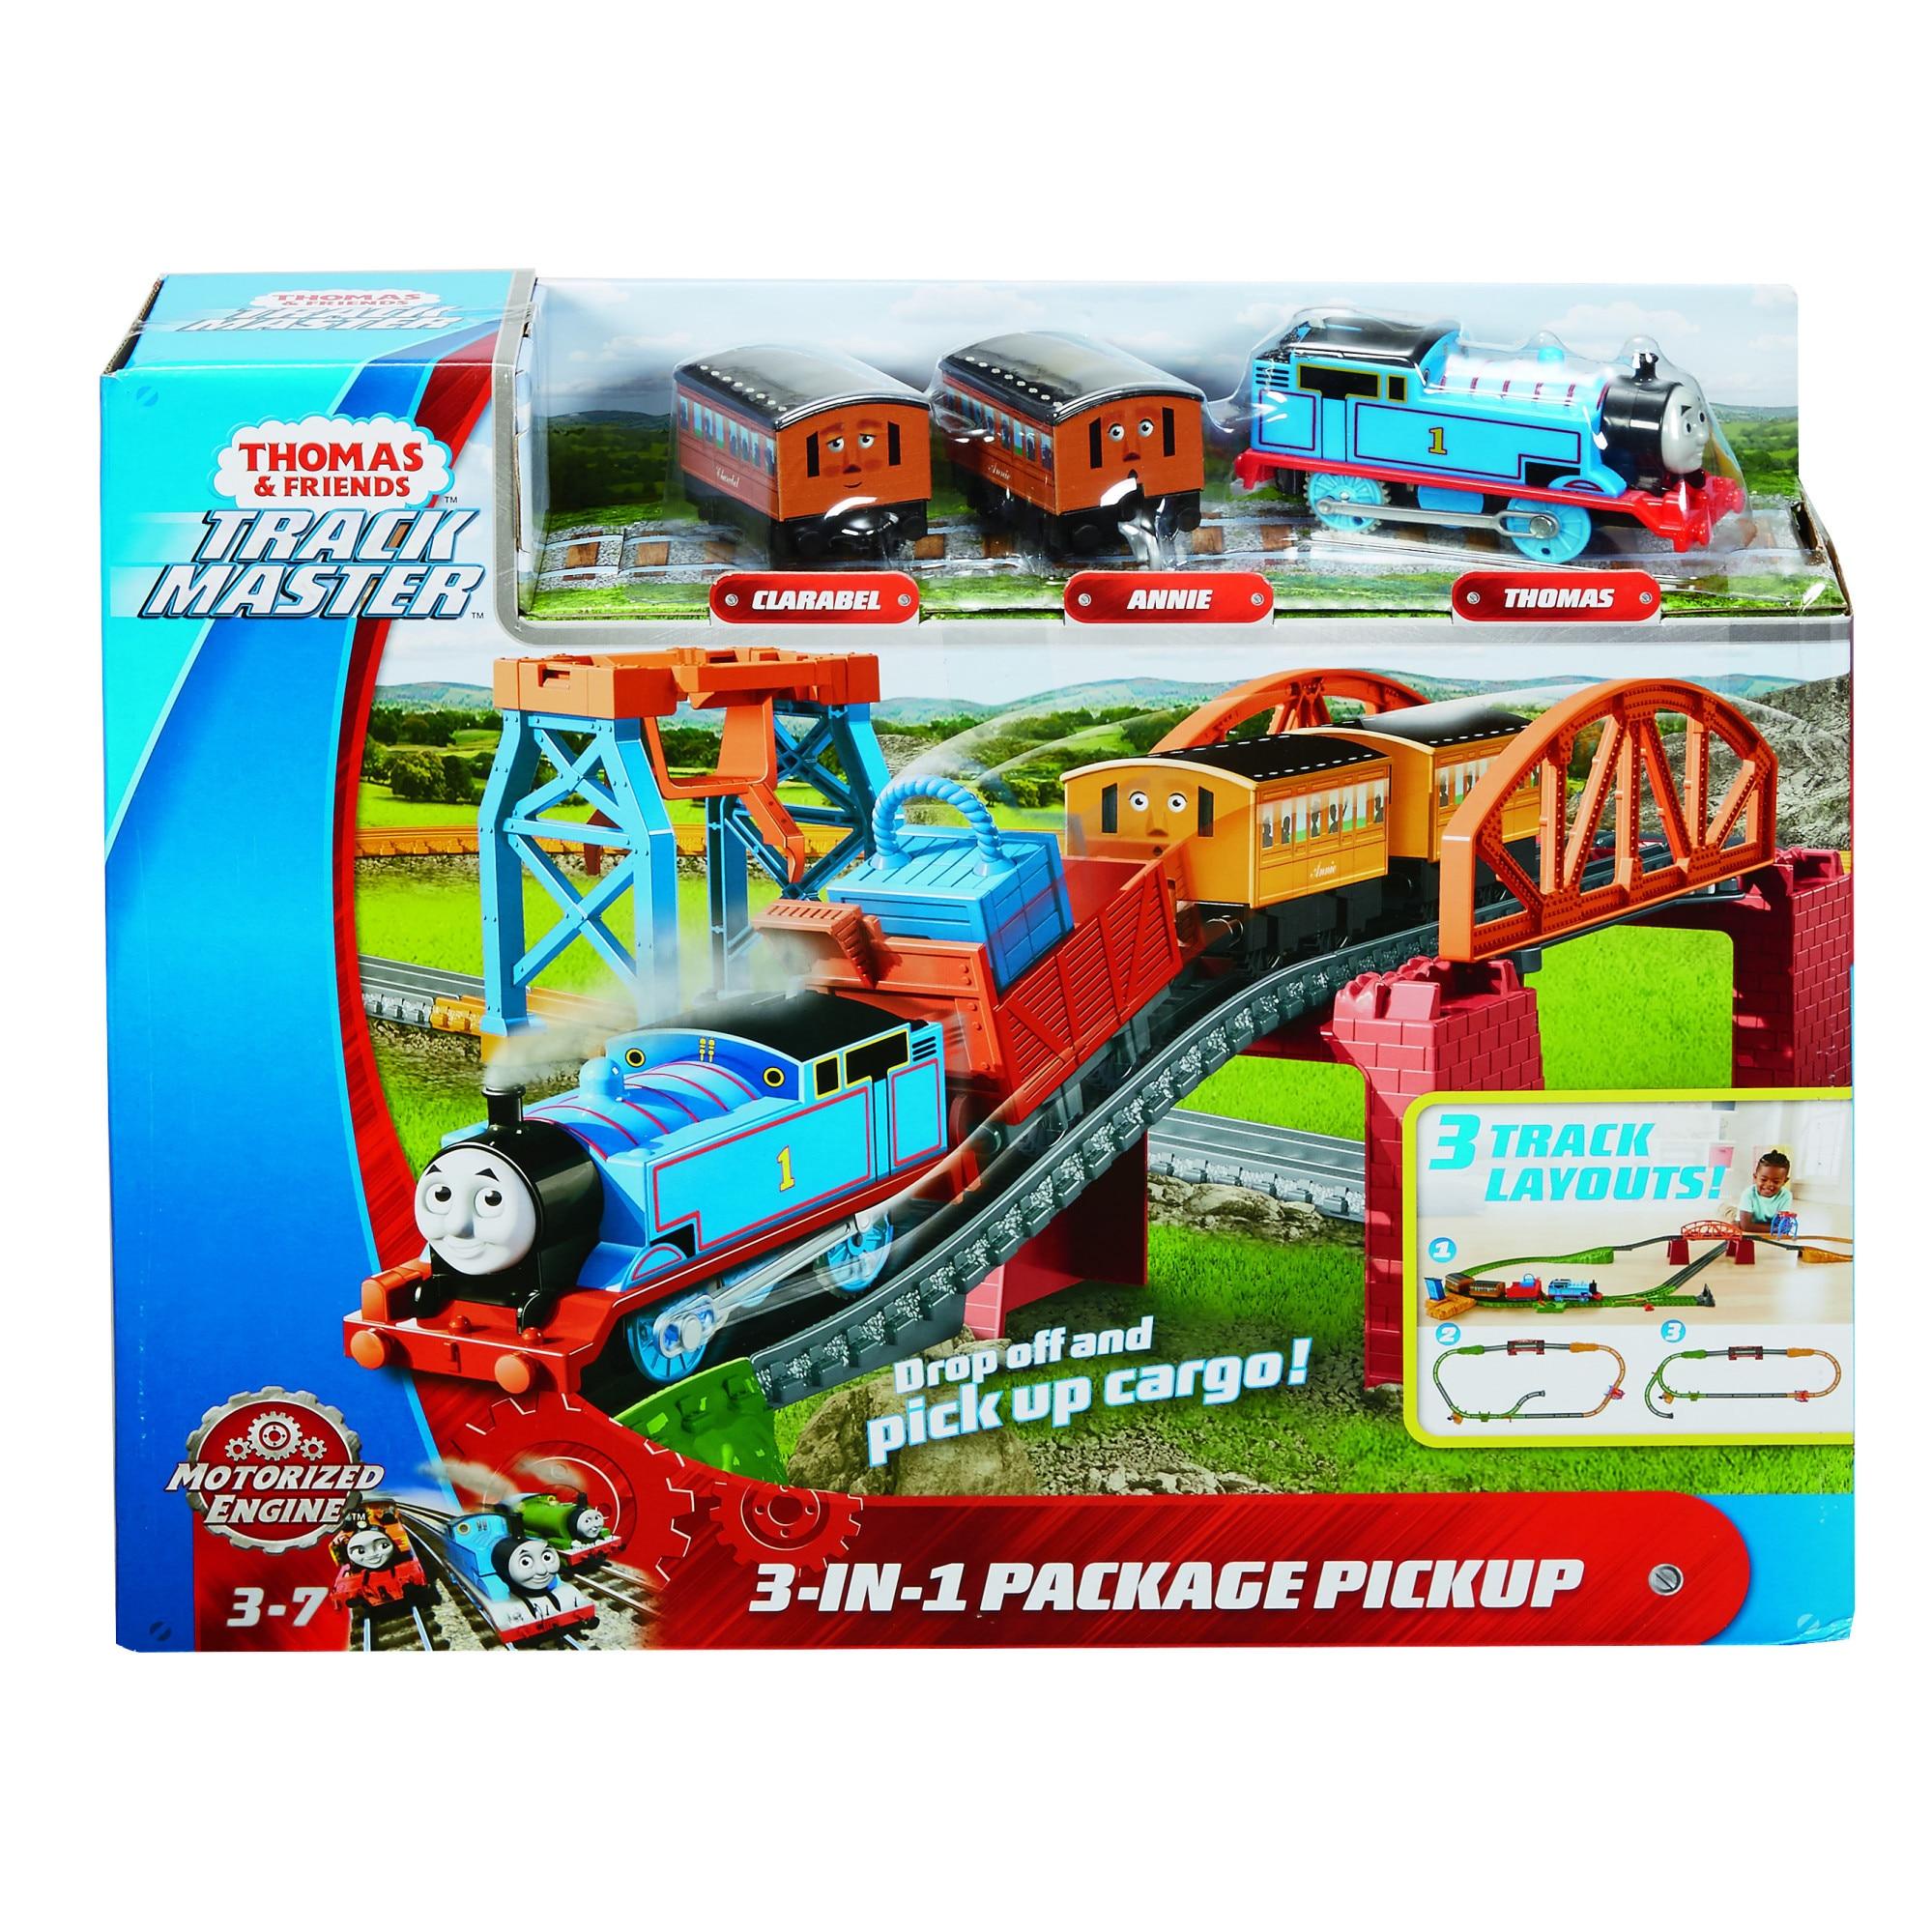 Fotografie Set de joaca Thomas & Friends 3 in 1 - Track Master, Package pickup